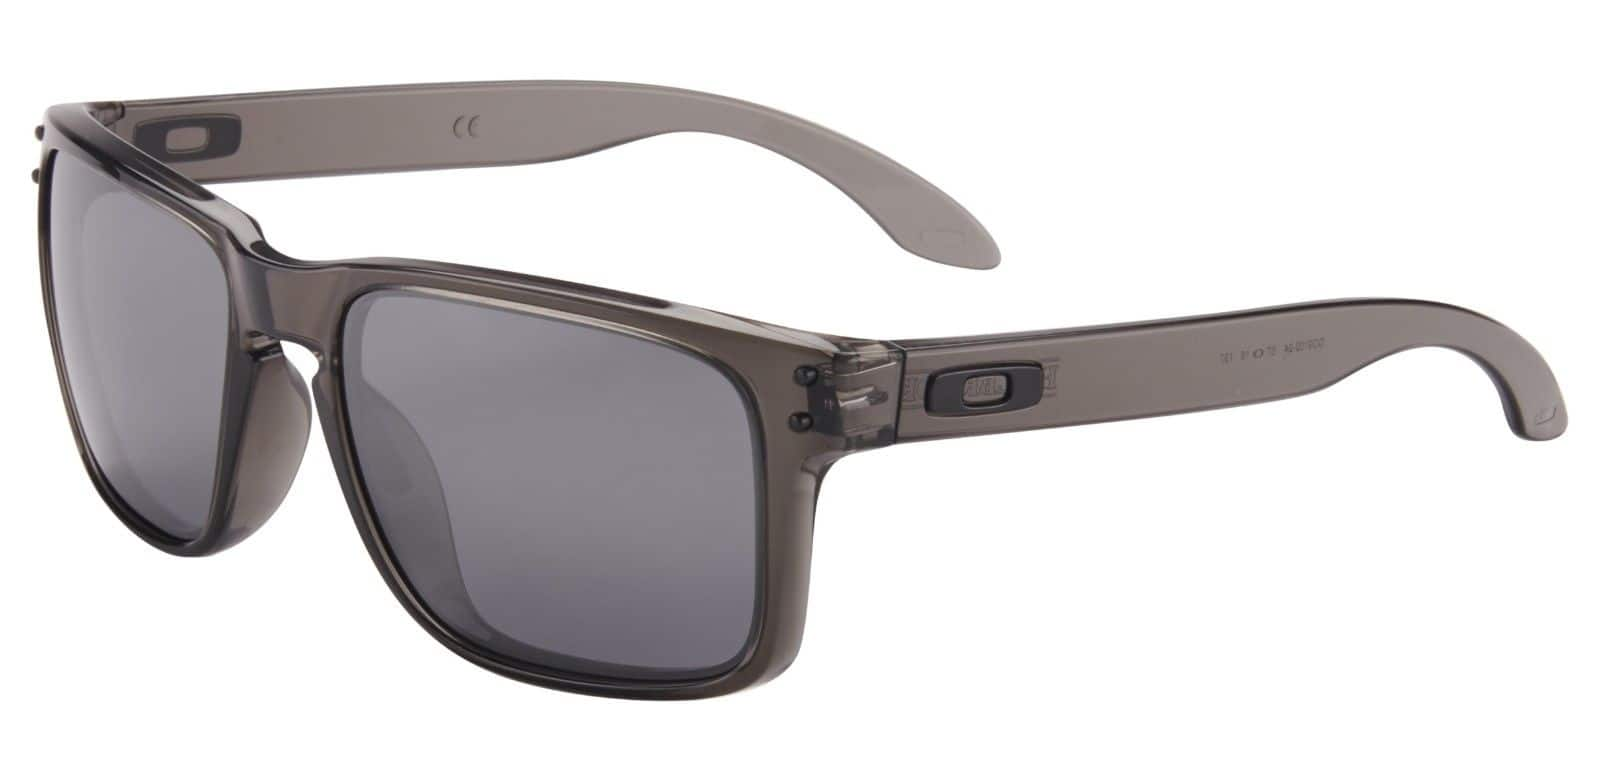 1a9e11521a Oakley Holbrook Sunglasses OO9102-24 Grey Smoke Frame Black Iridium Lens  For  44.99 + Free Shipping